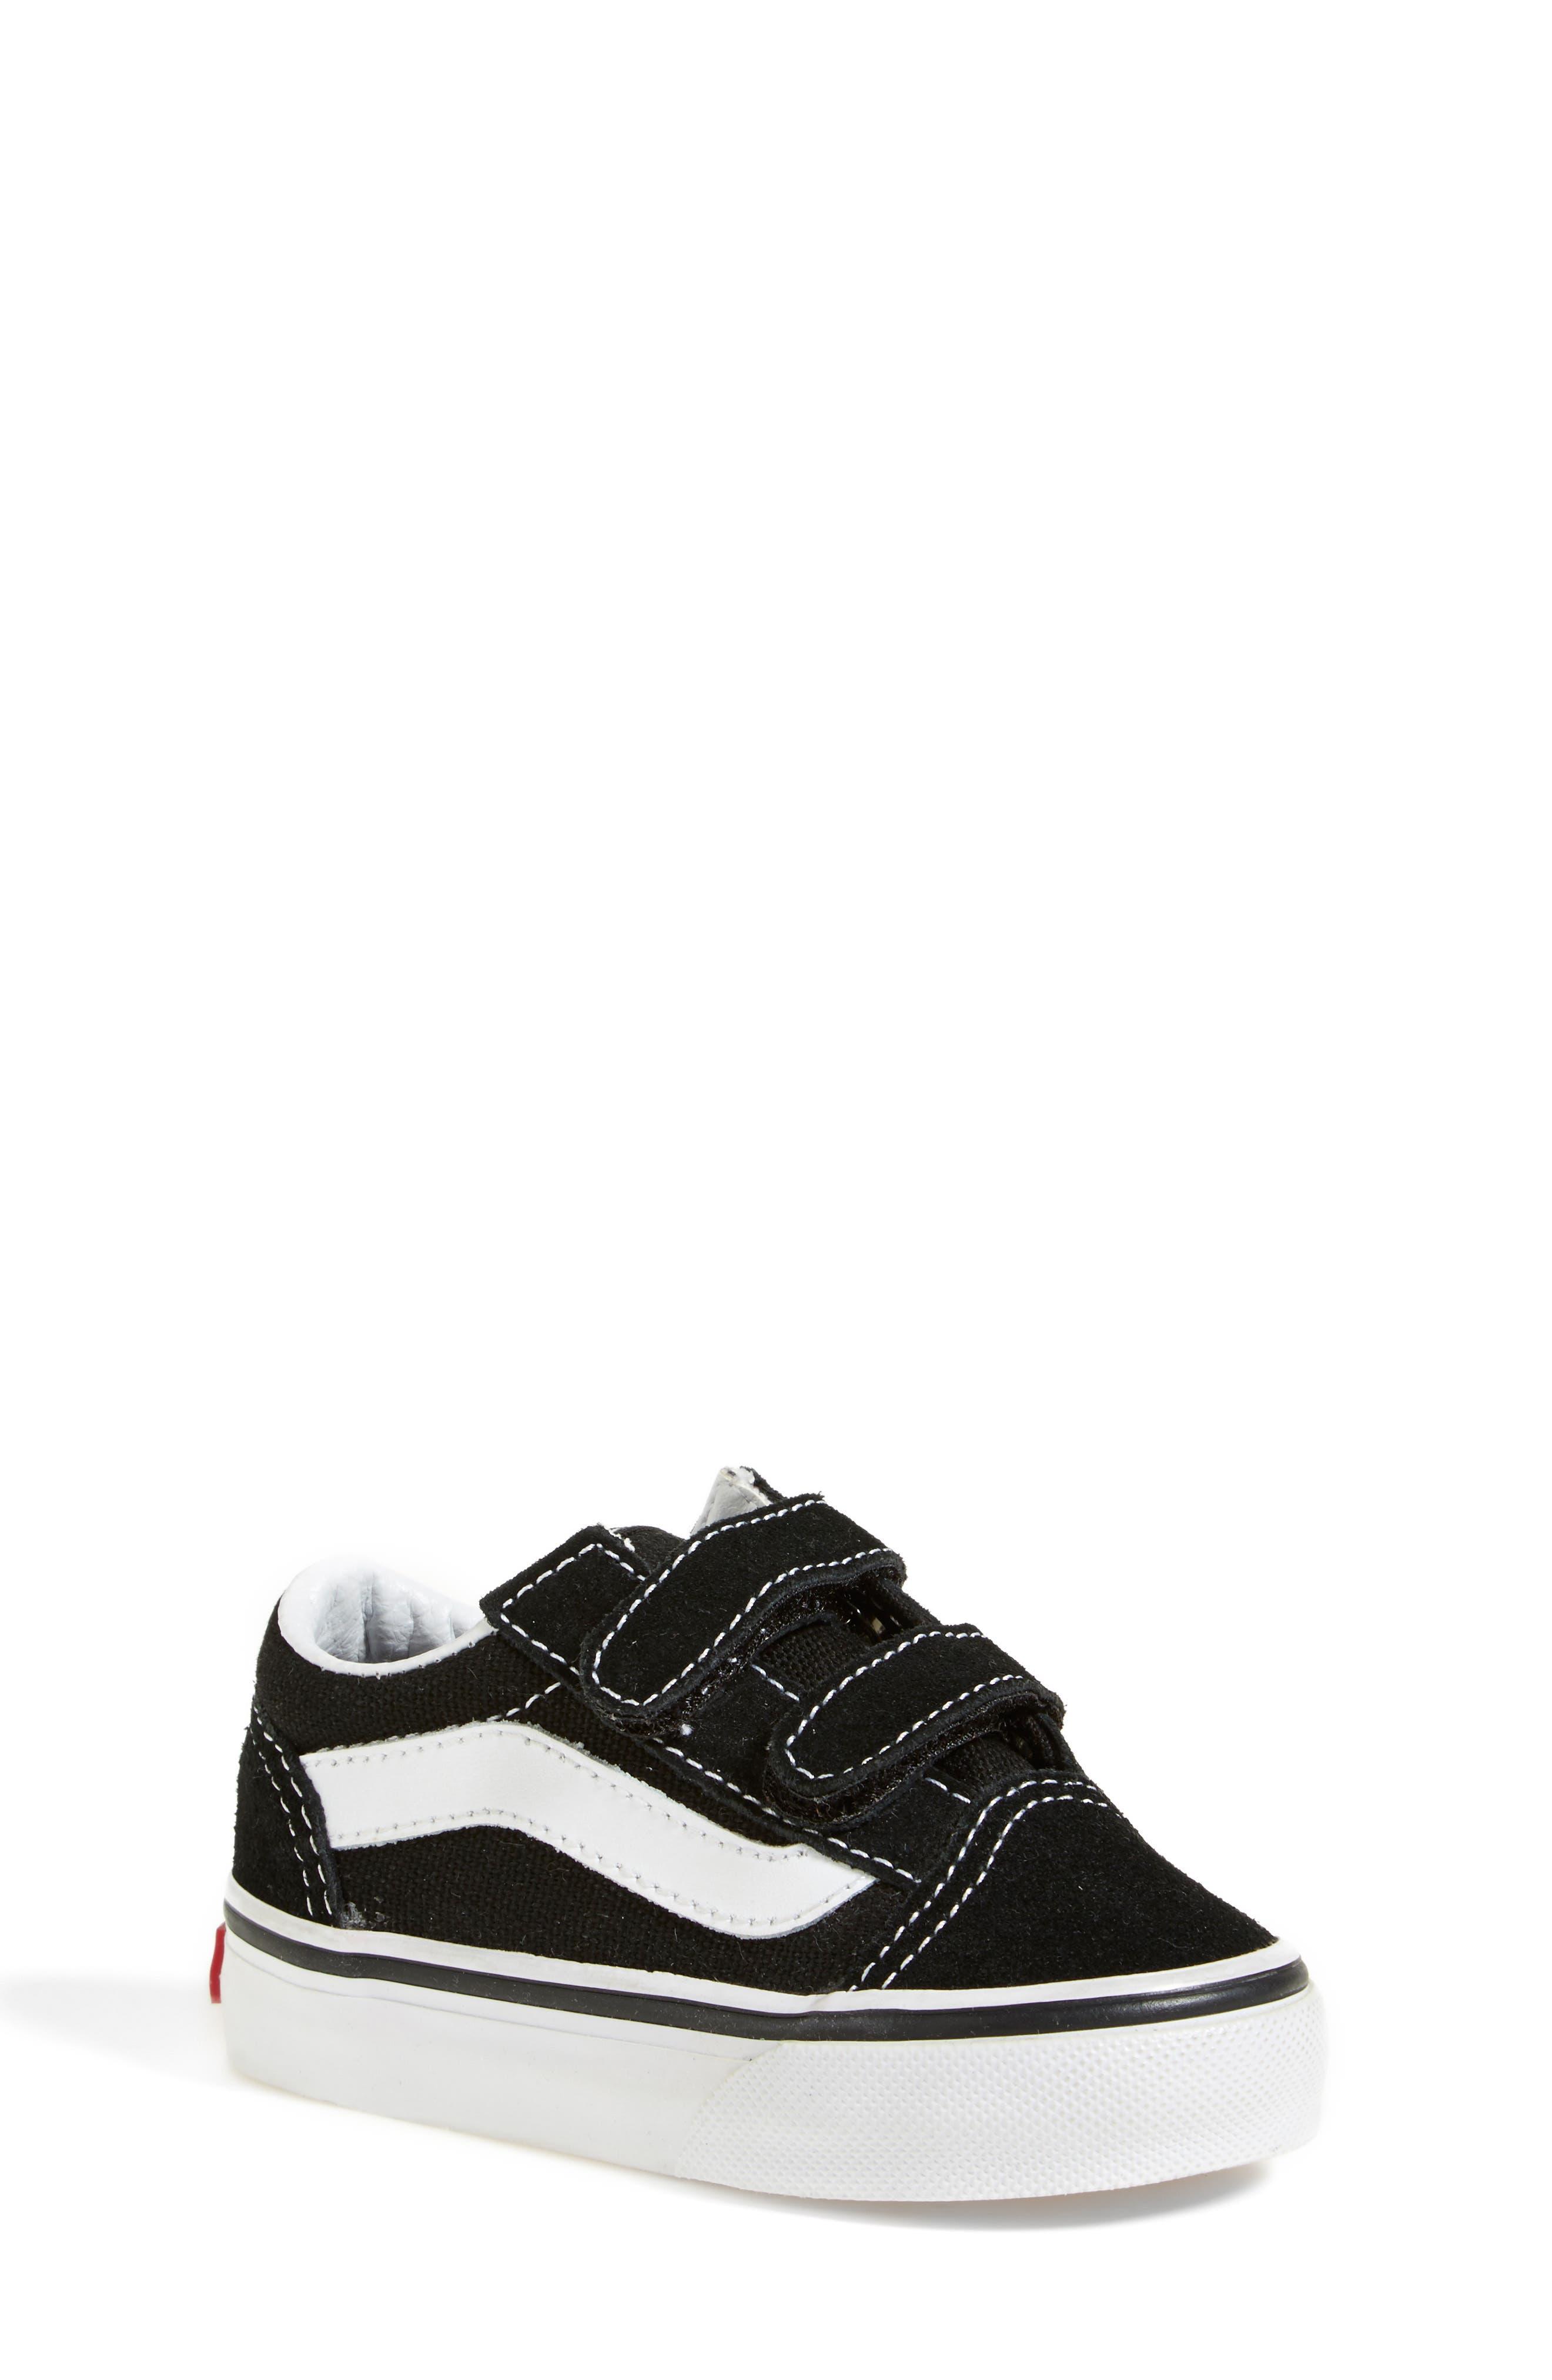 'Old Skool' Sneaker,                         Main,                         color, Black